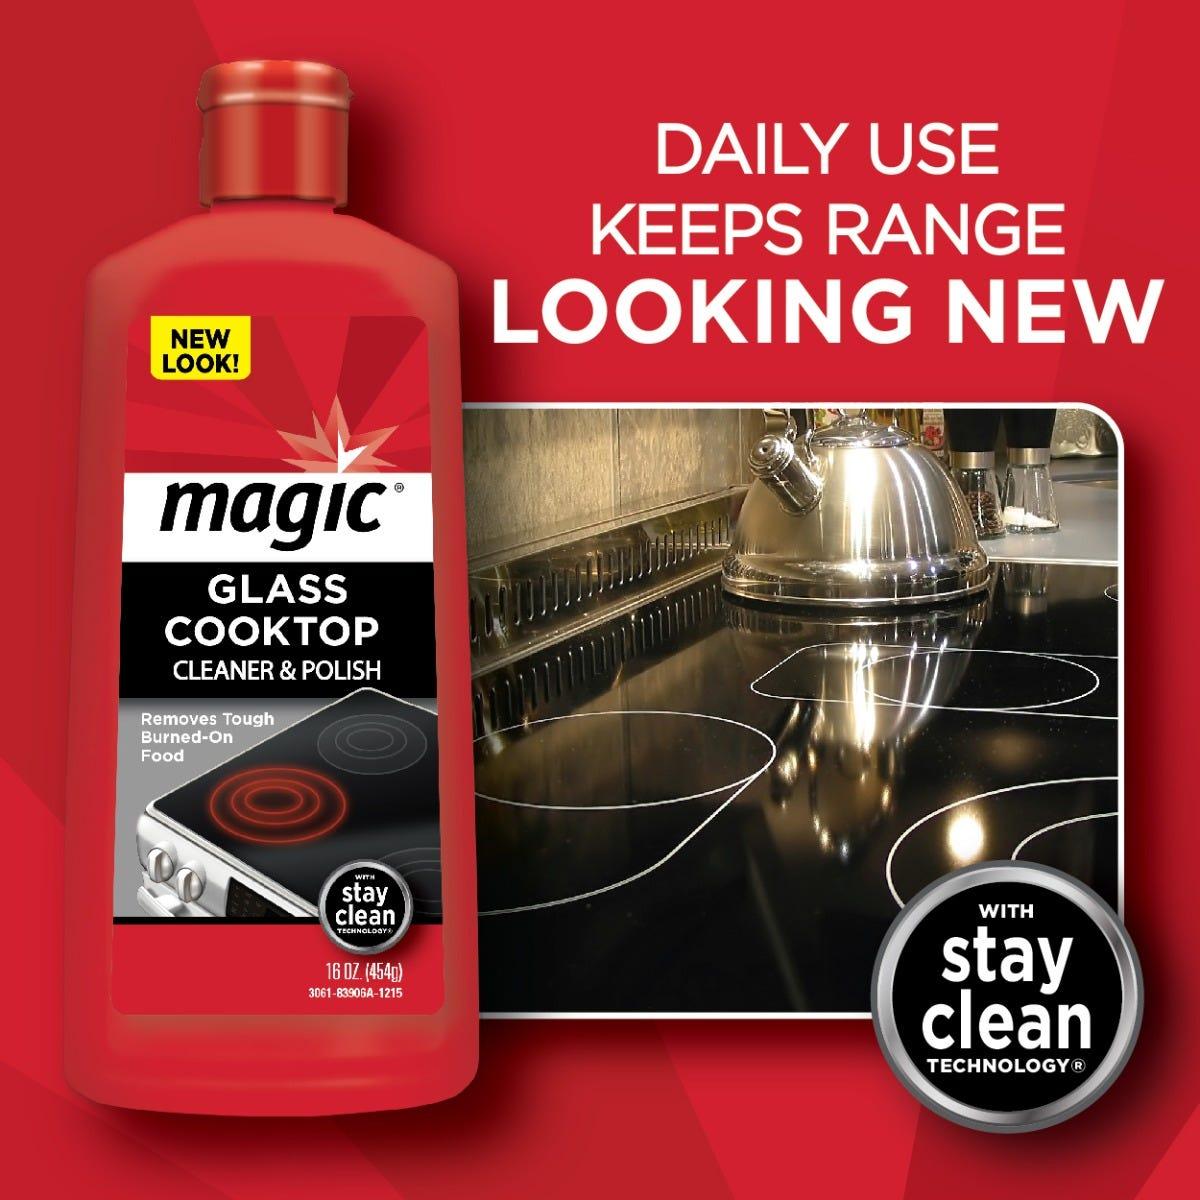 https://googone.com/media/catalog/product/m/a/magic_cooktop_cleaner_polish_beauty_1_1.jpg